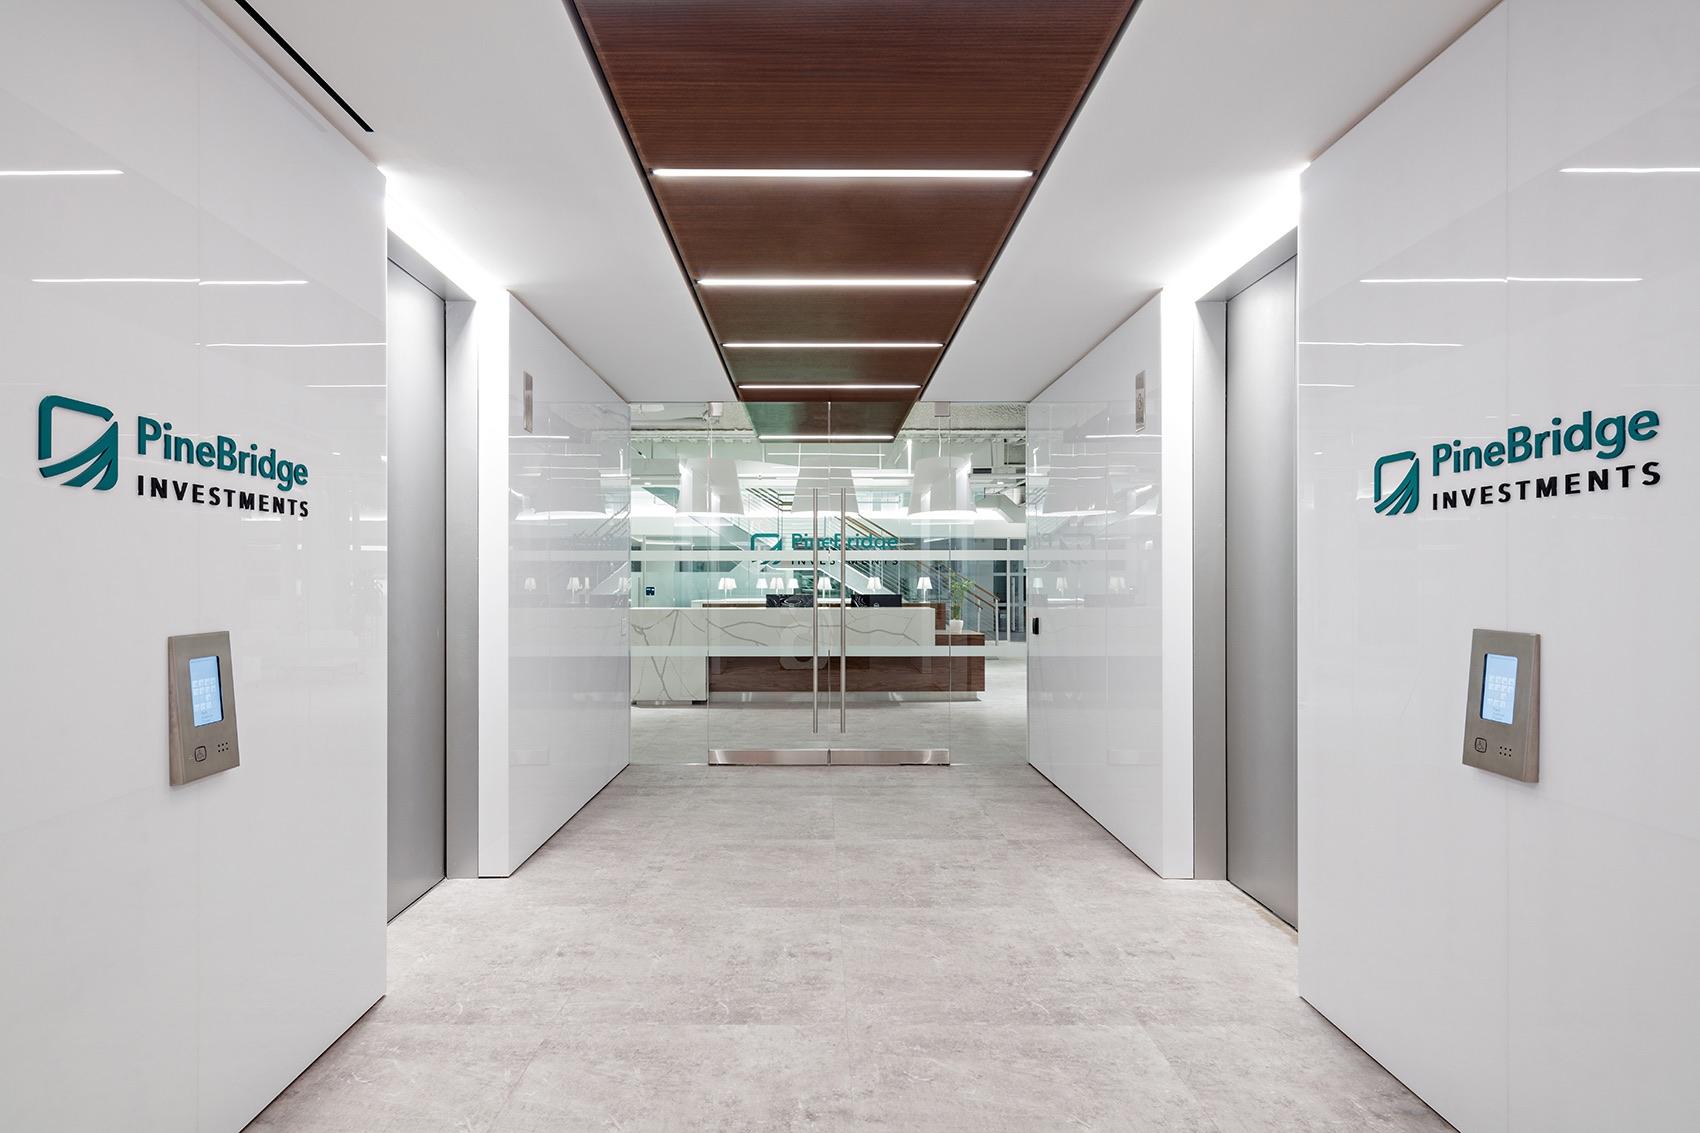 pine-bridge-investments-office-3